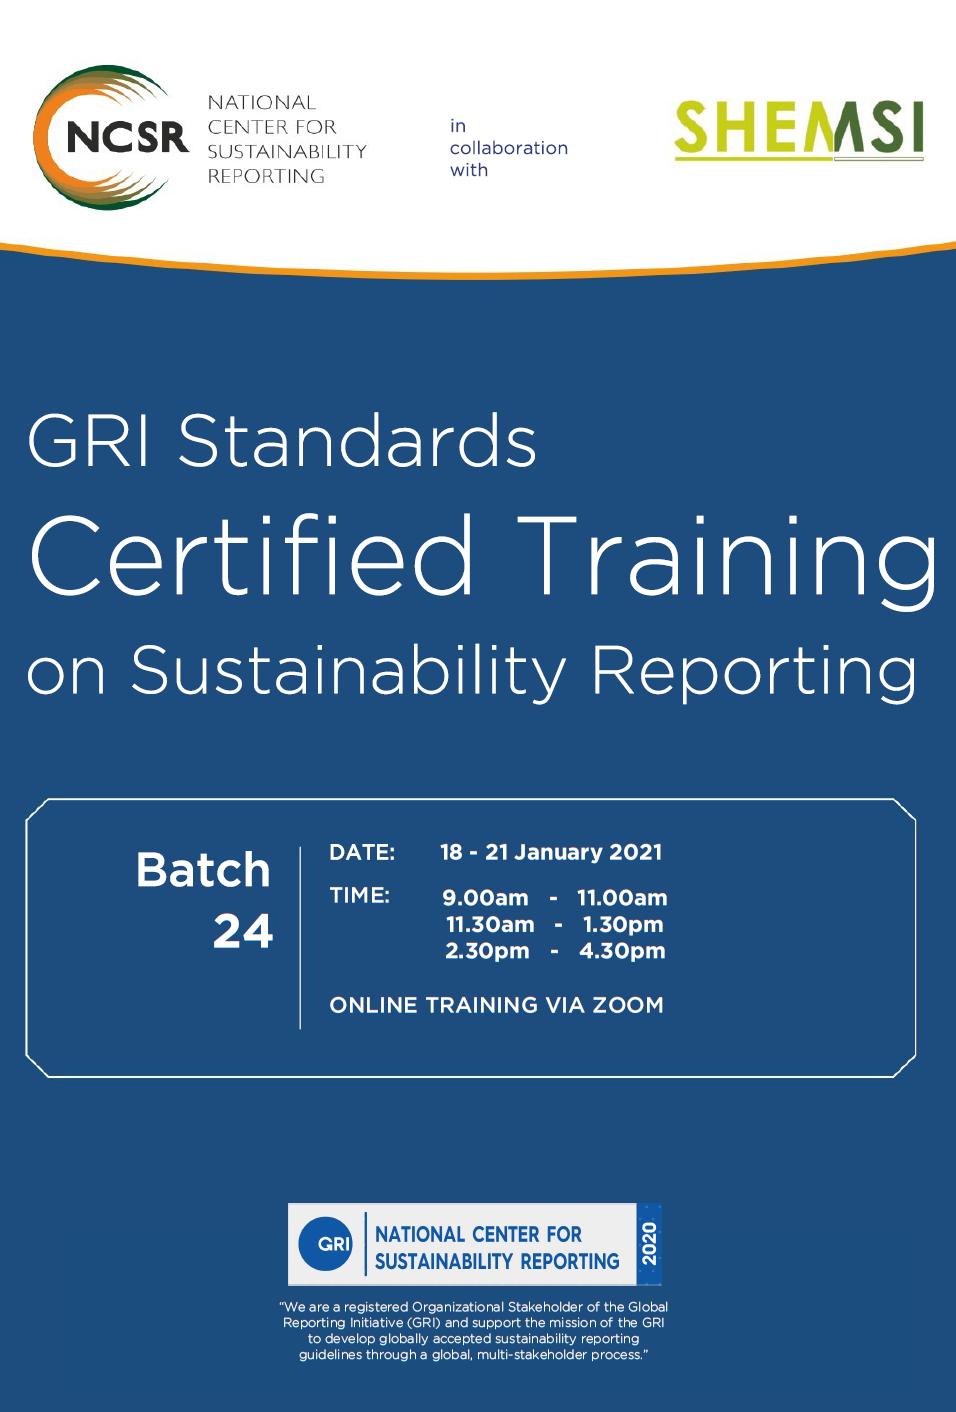 GRI Standards Certified Training,18 - 21 Jan 2021 Malaysia